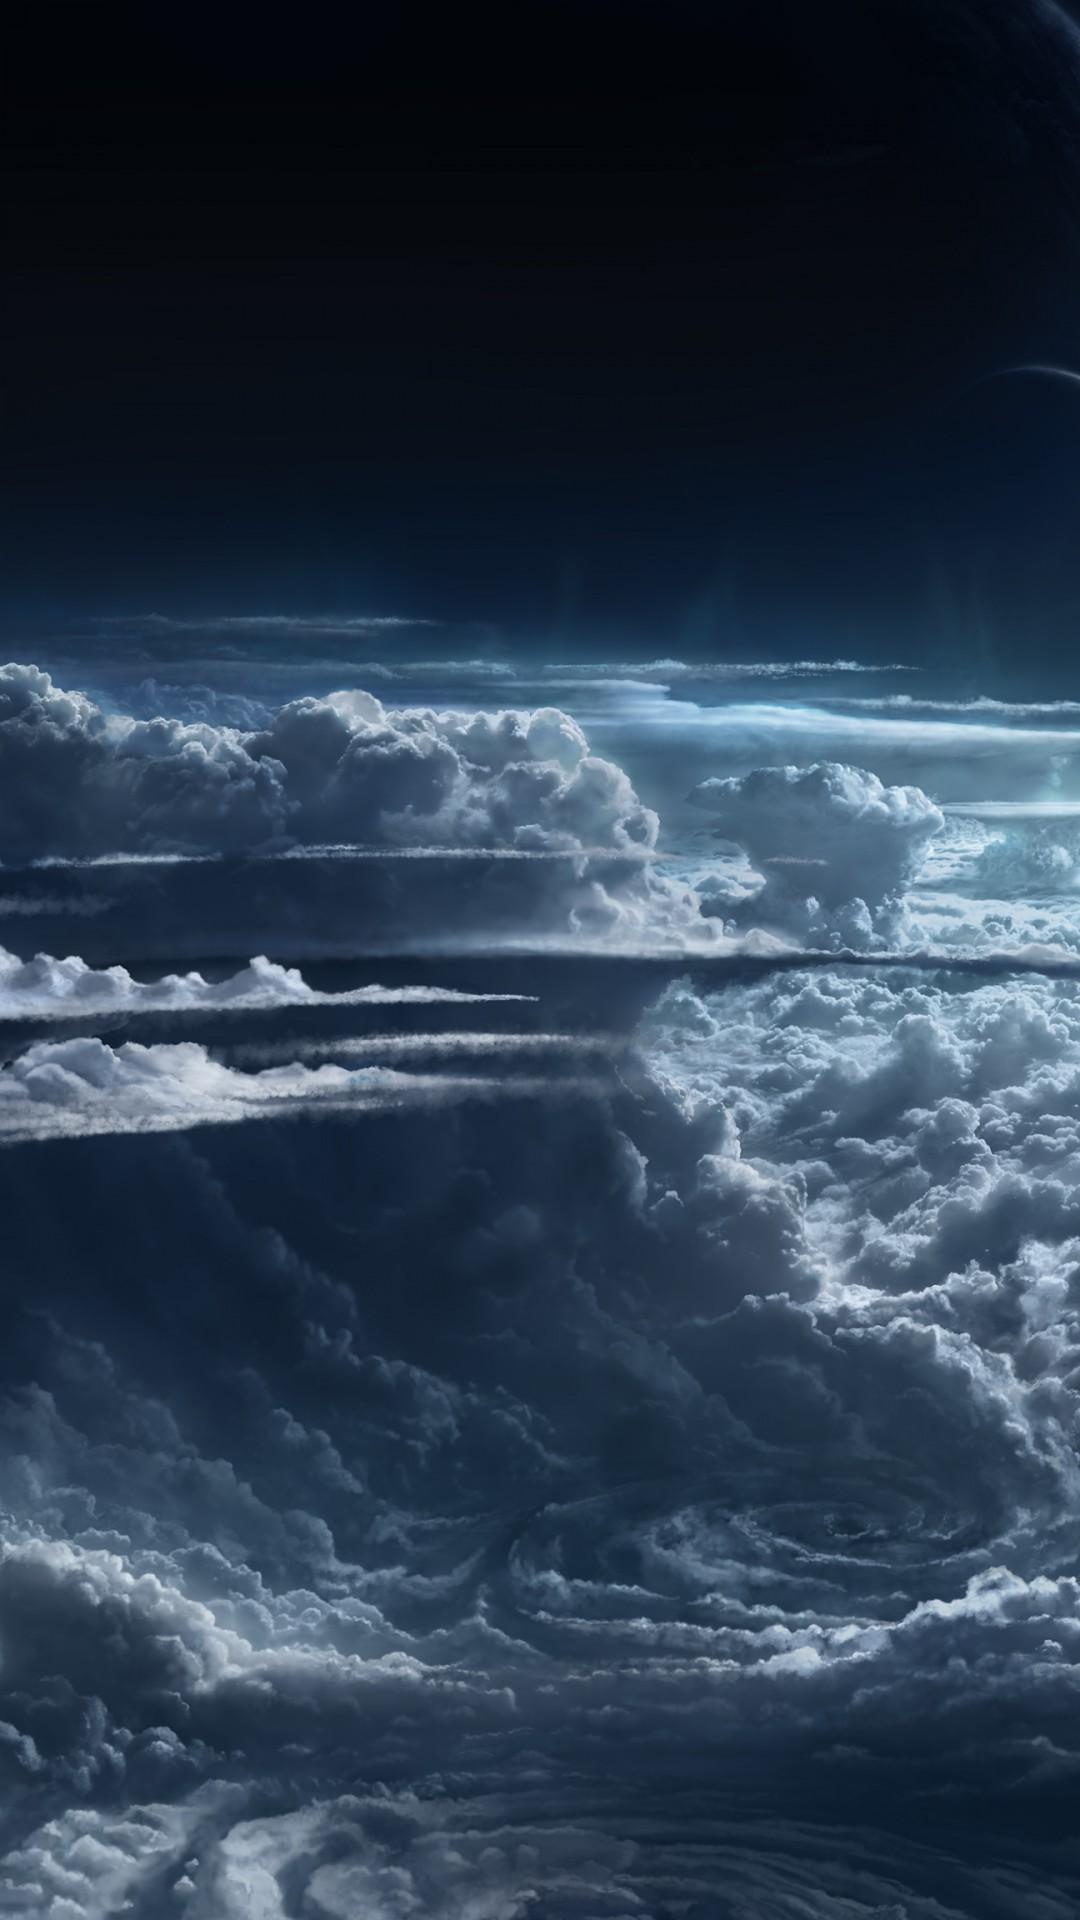 Wallpaper Sky 5k 4k Wallpaper Clouds Planet Light